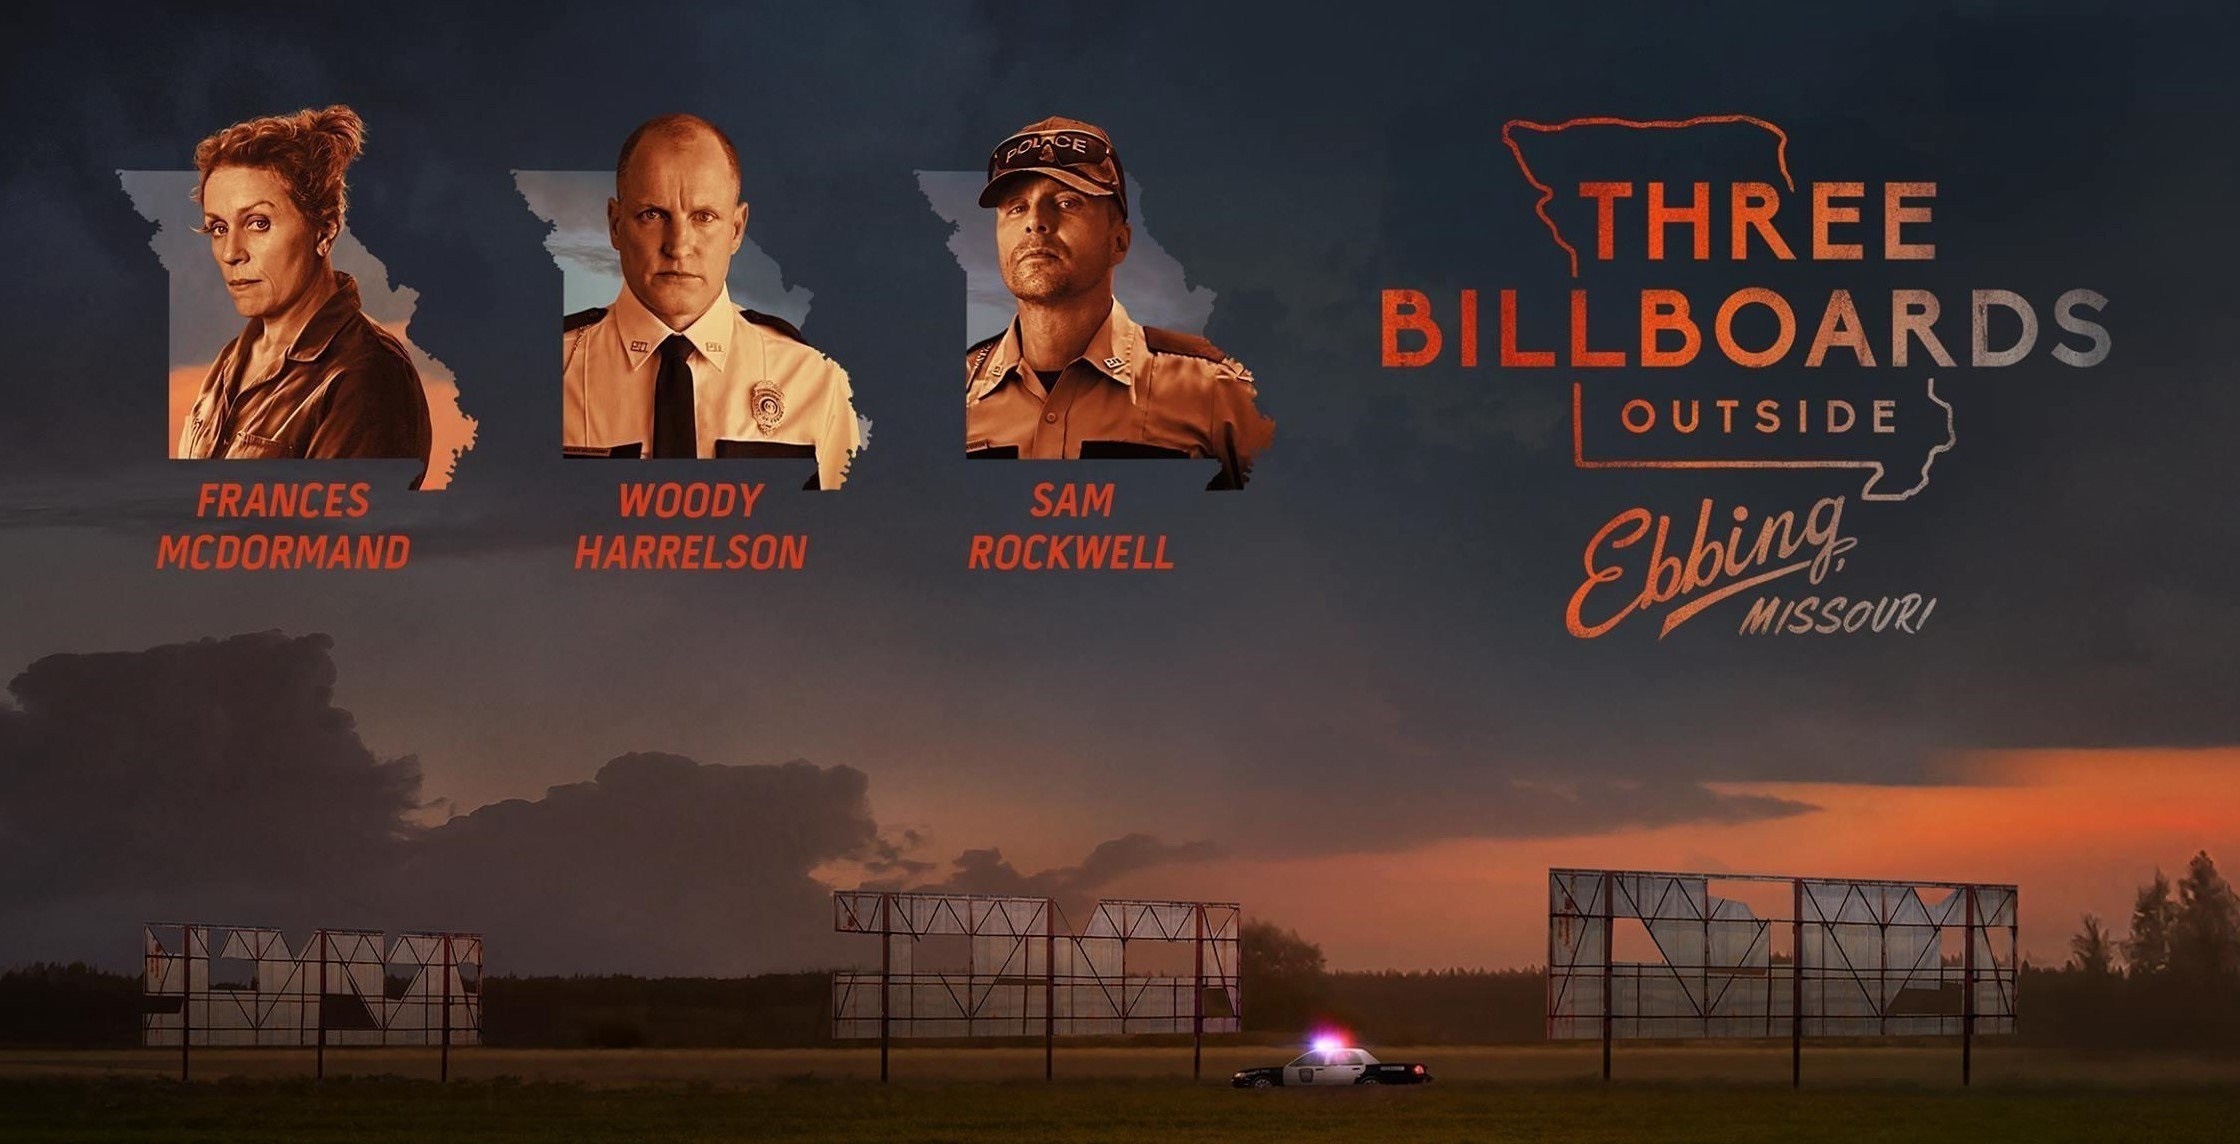 27 сентября – кинопросмотр с дискуссией «Три билборда на границе Эббинга, Миссури»